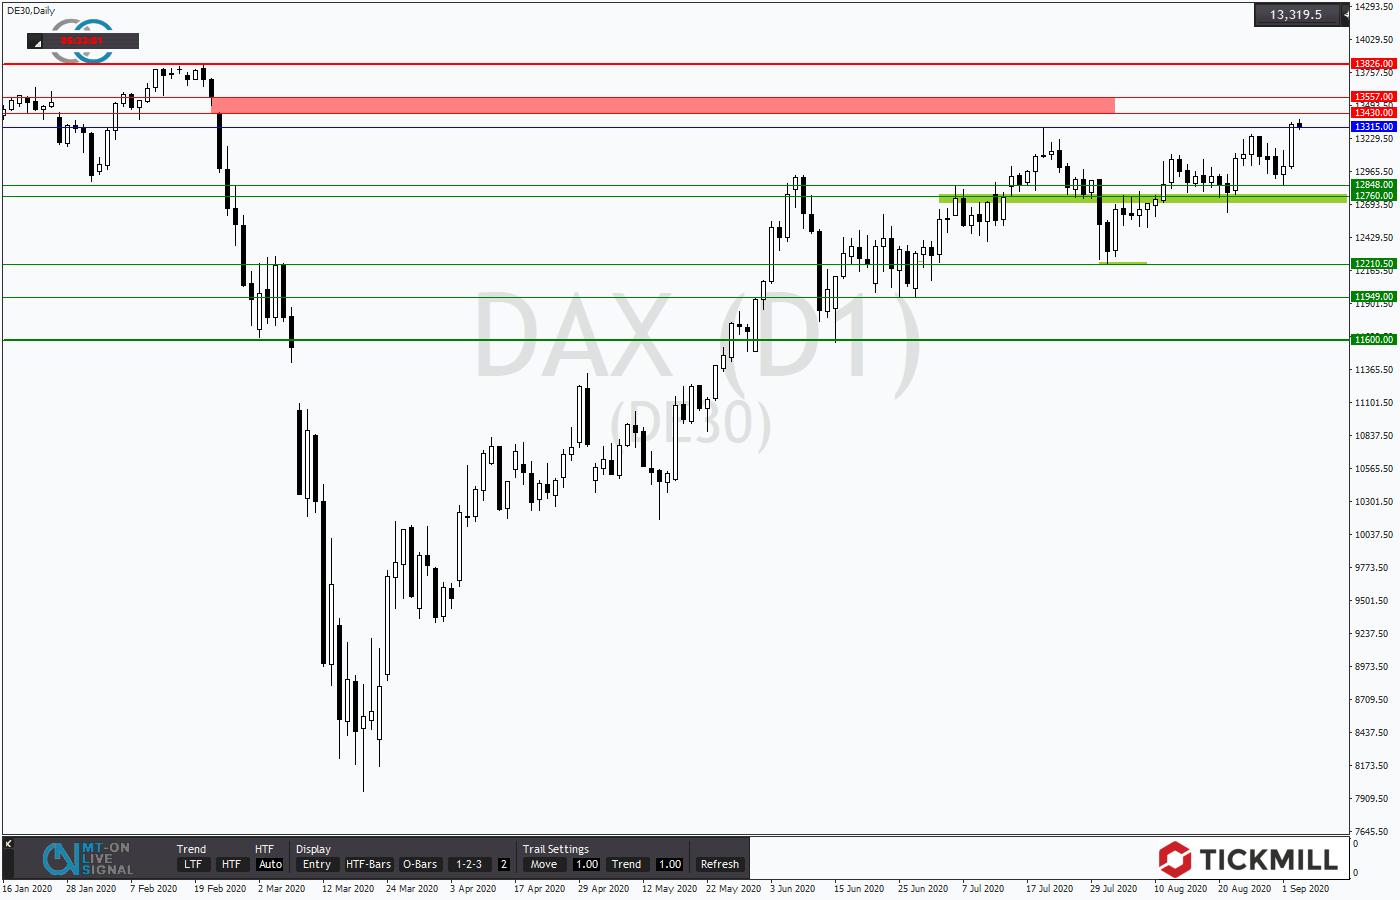 Tickmill-Analyse: DAX im Tageschart